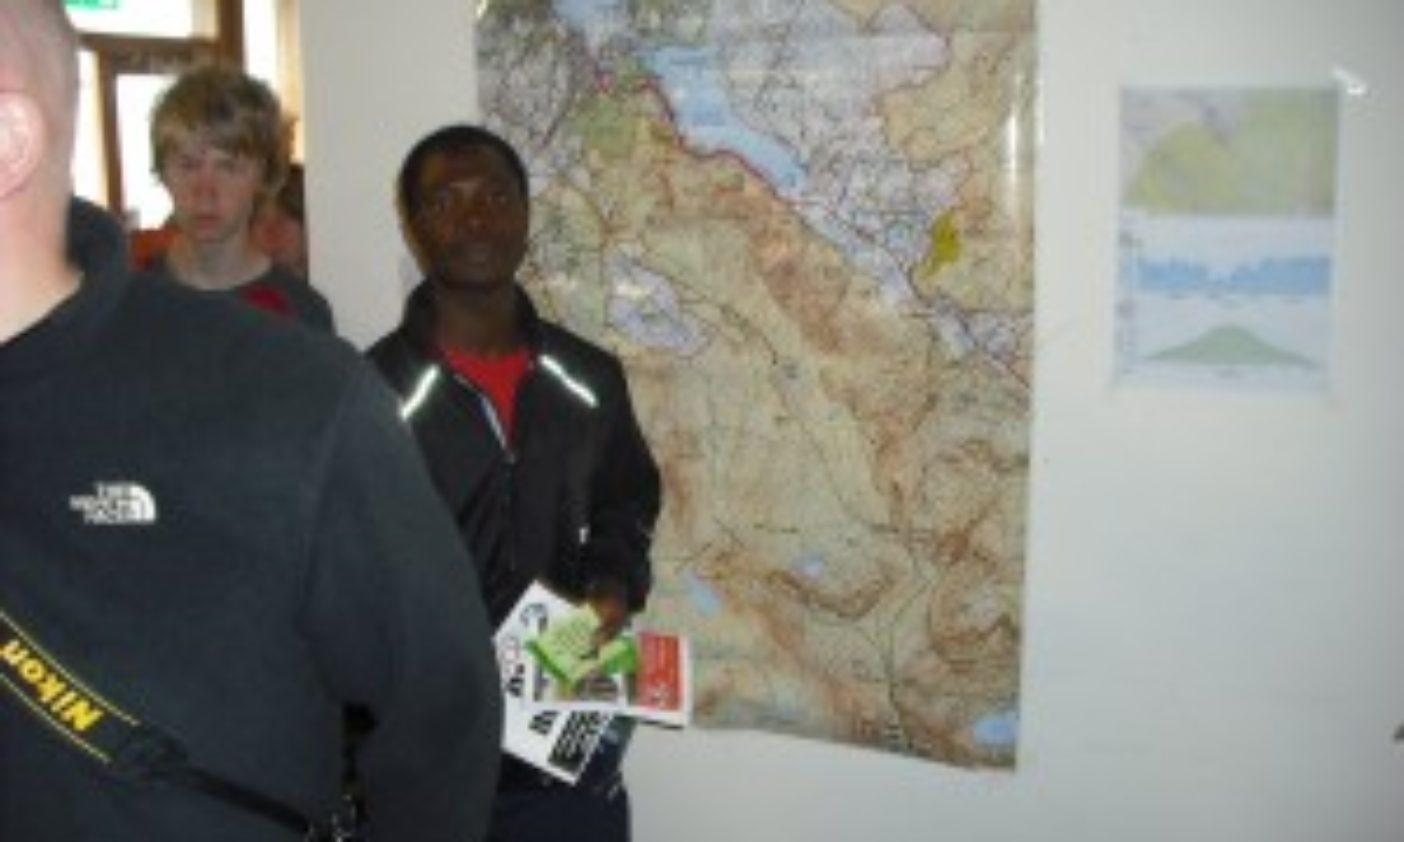 Amidou's Snowdon training plan